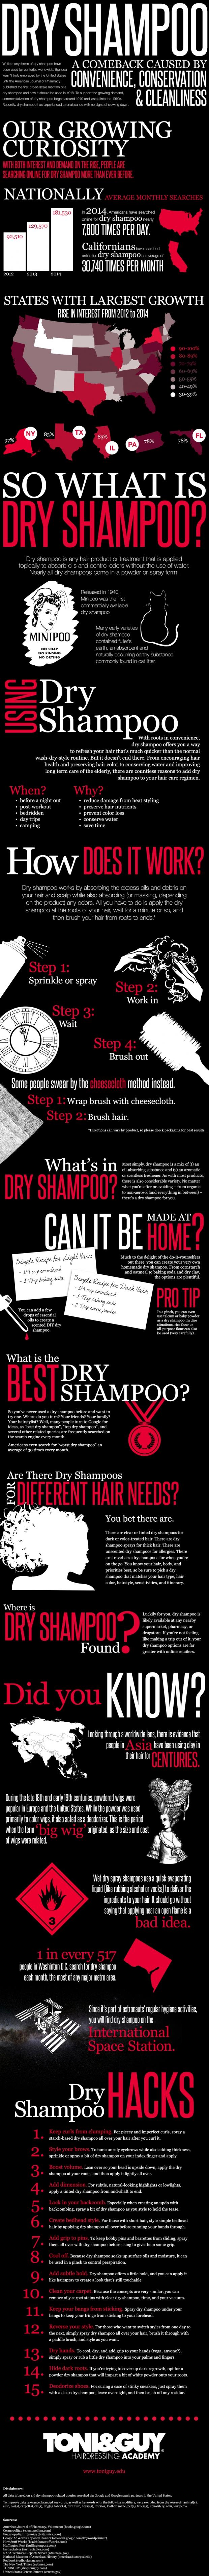 TONIGUY-Dry-Shampoo-Infographic